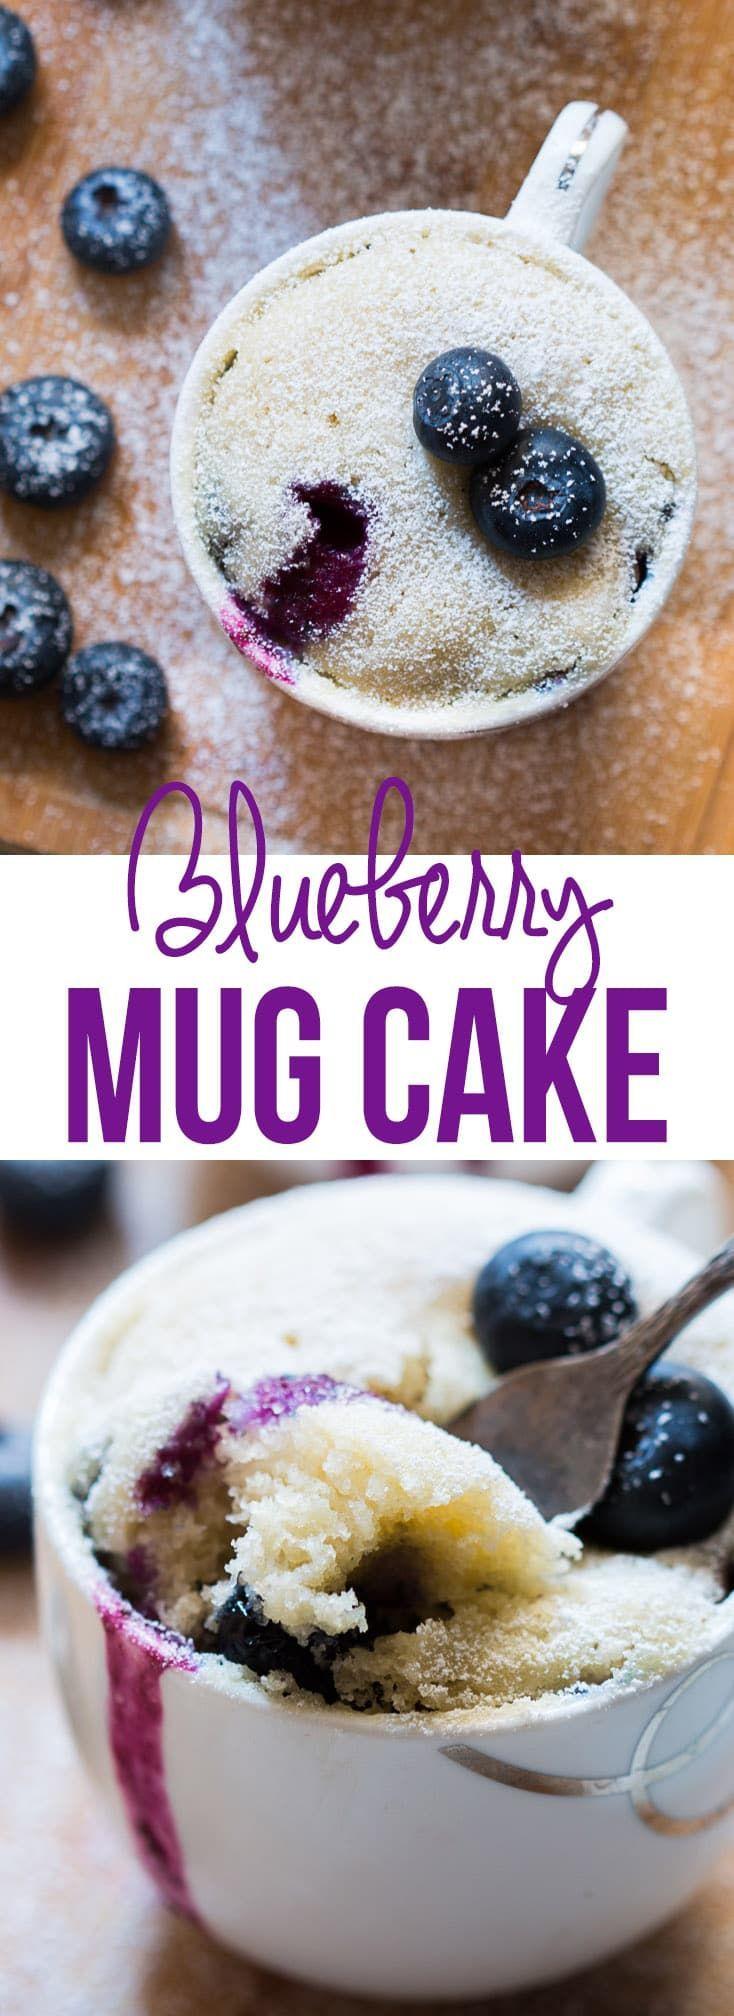 Eggless Blueberry Microwave Mug Cake